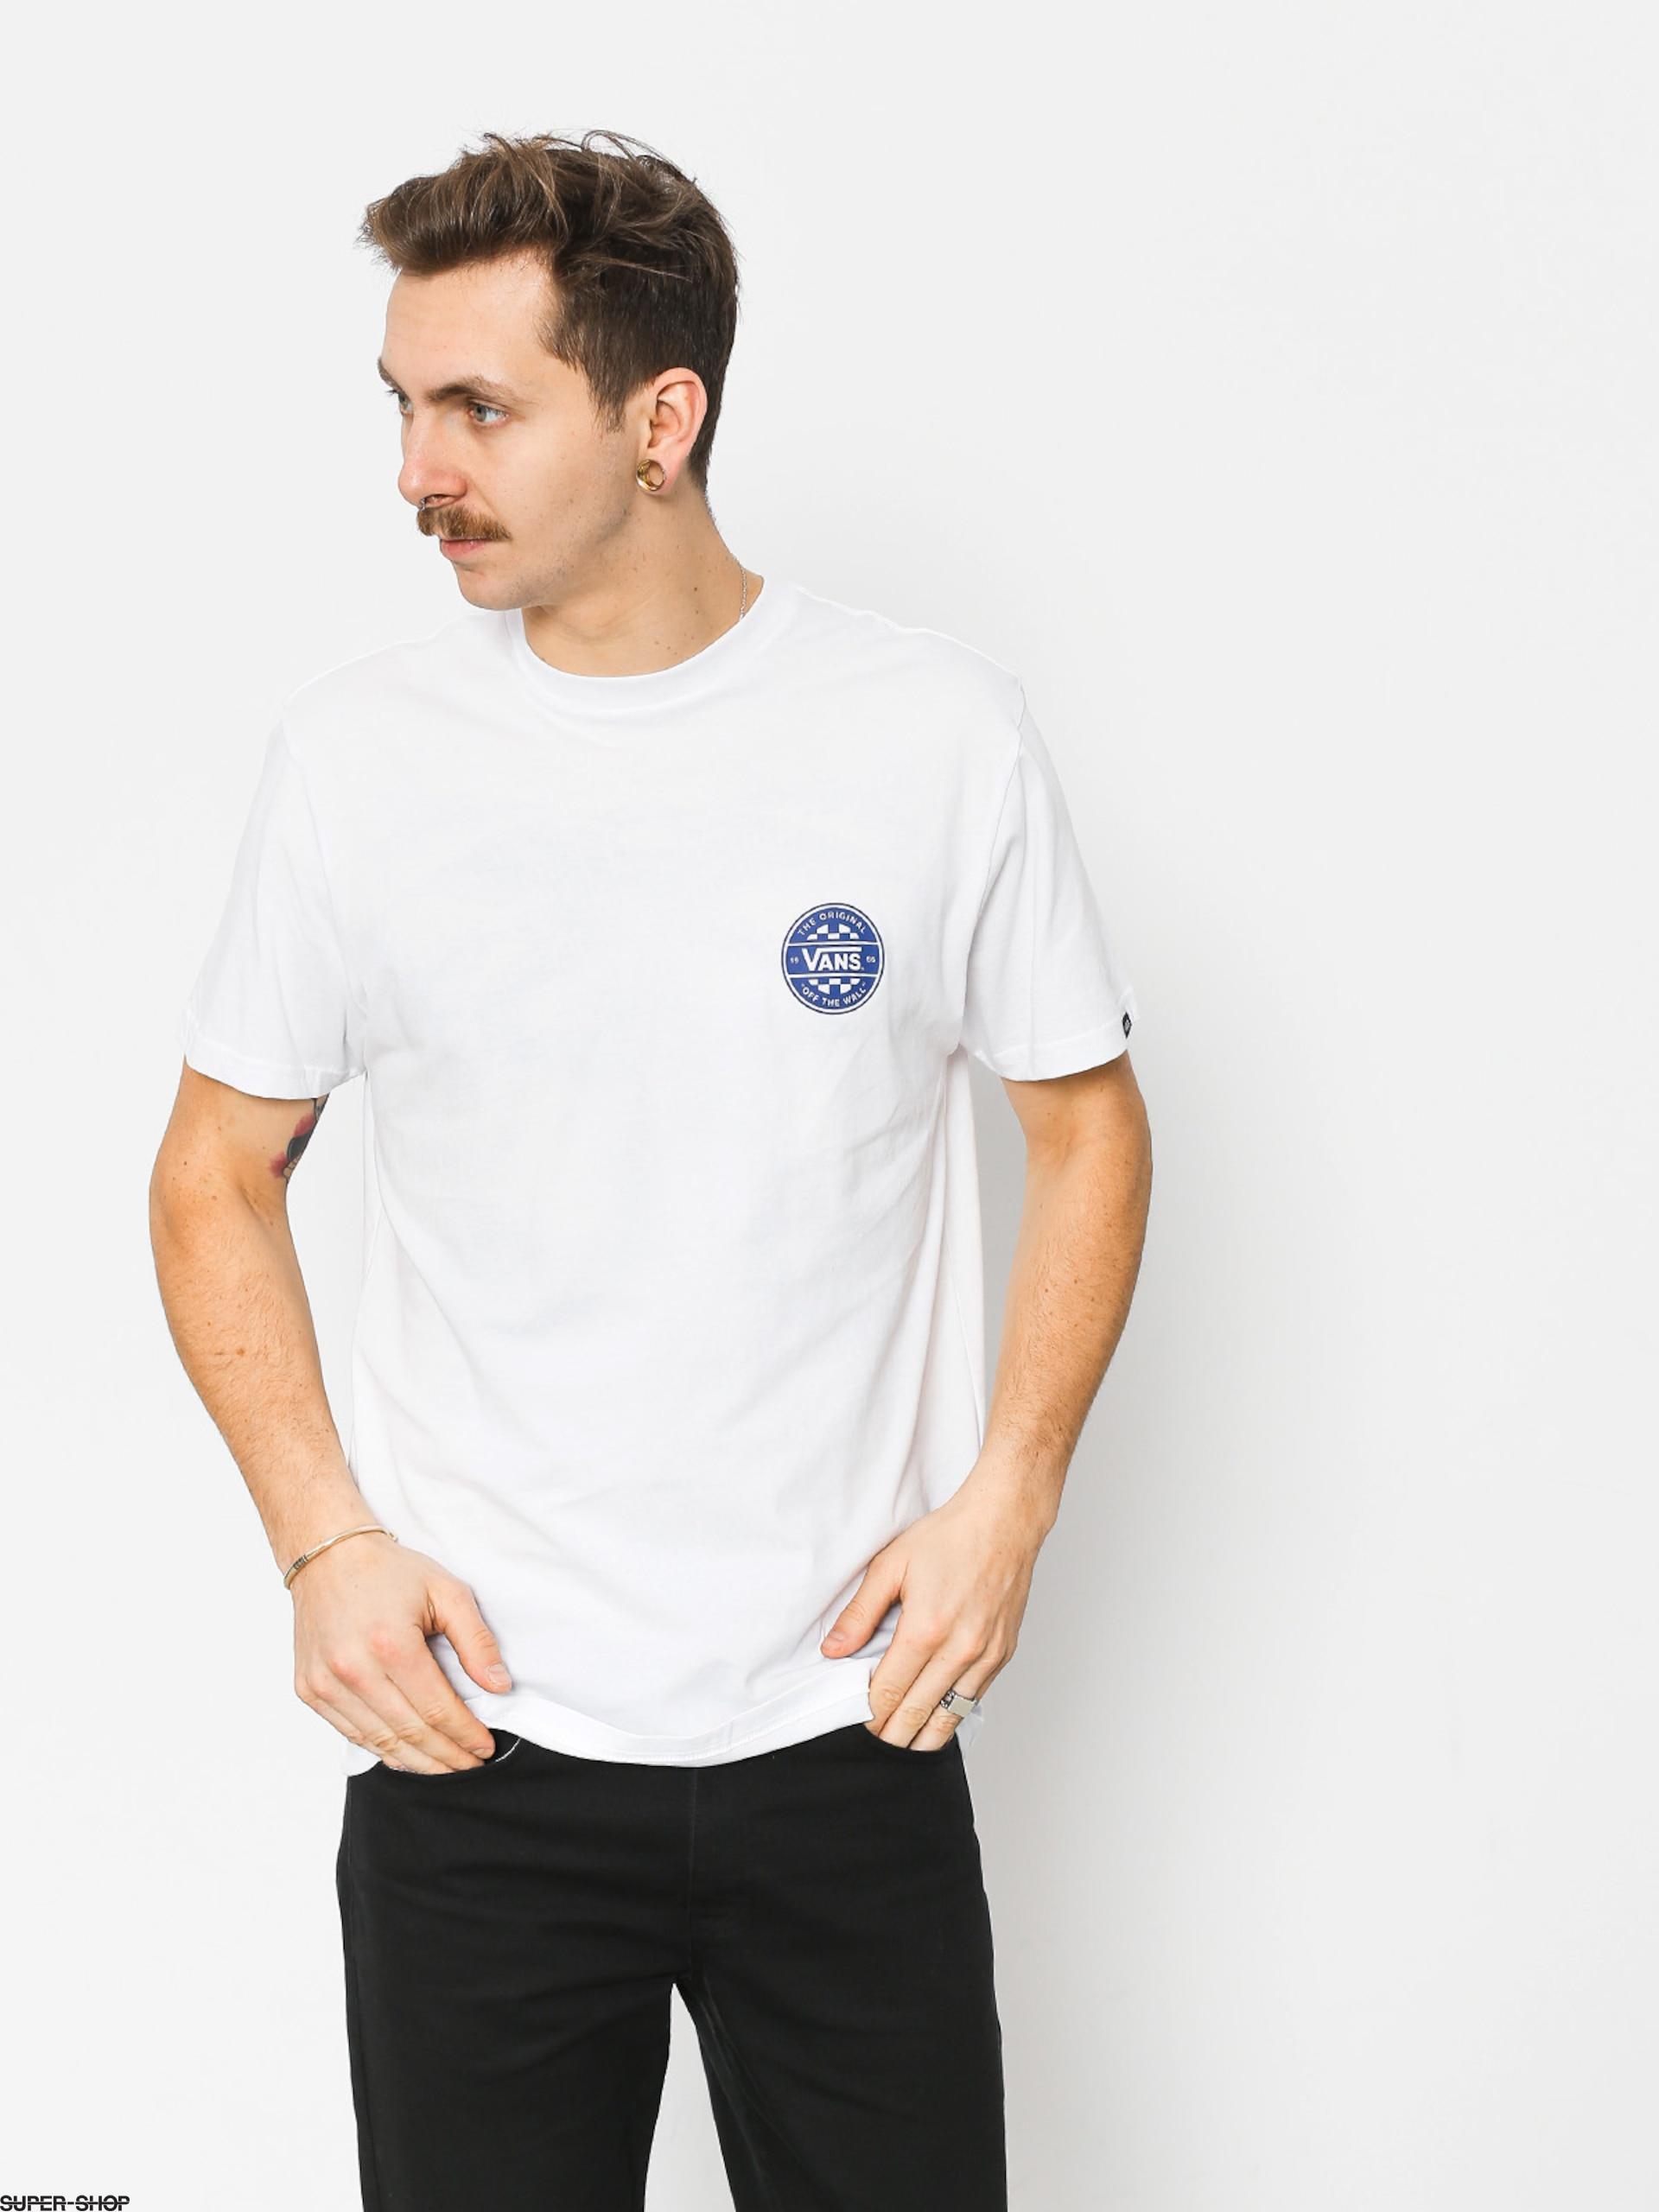 ec01550e 1000453-w1920-vans-checker-co-tshirt-white.jpg